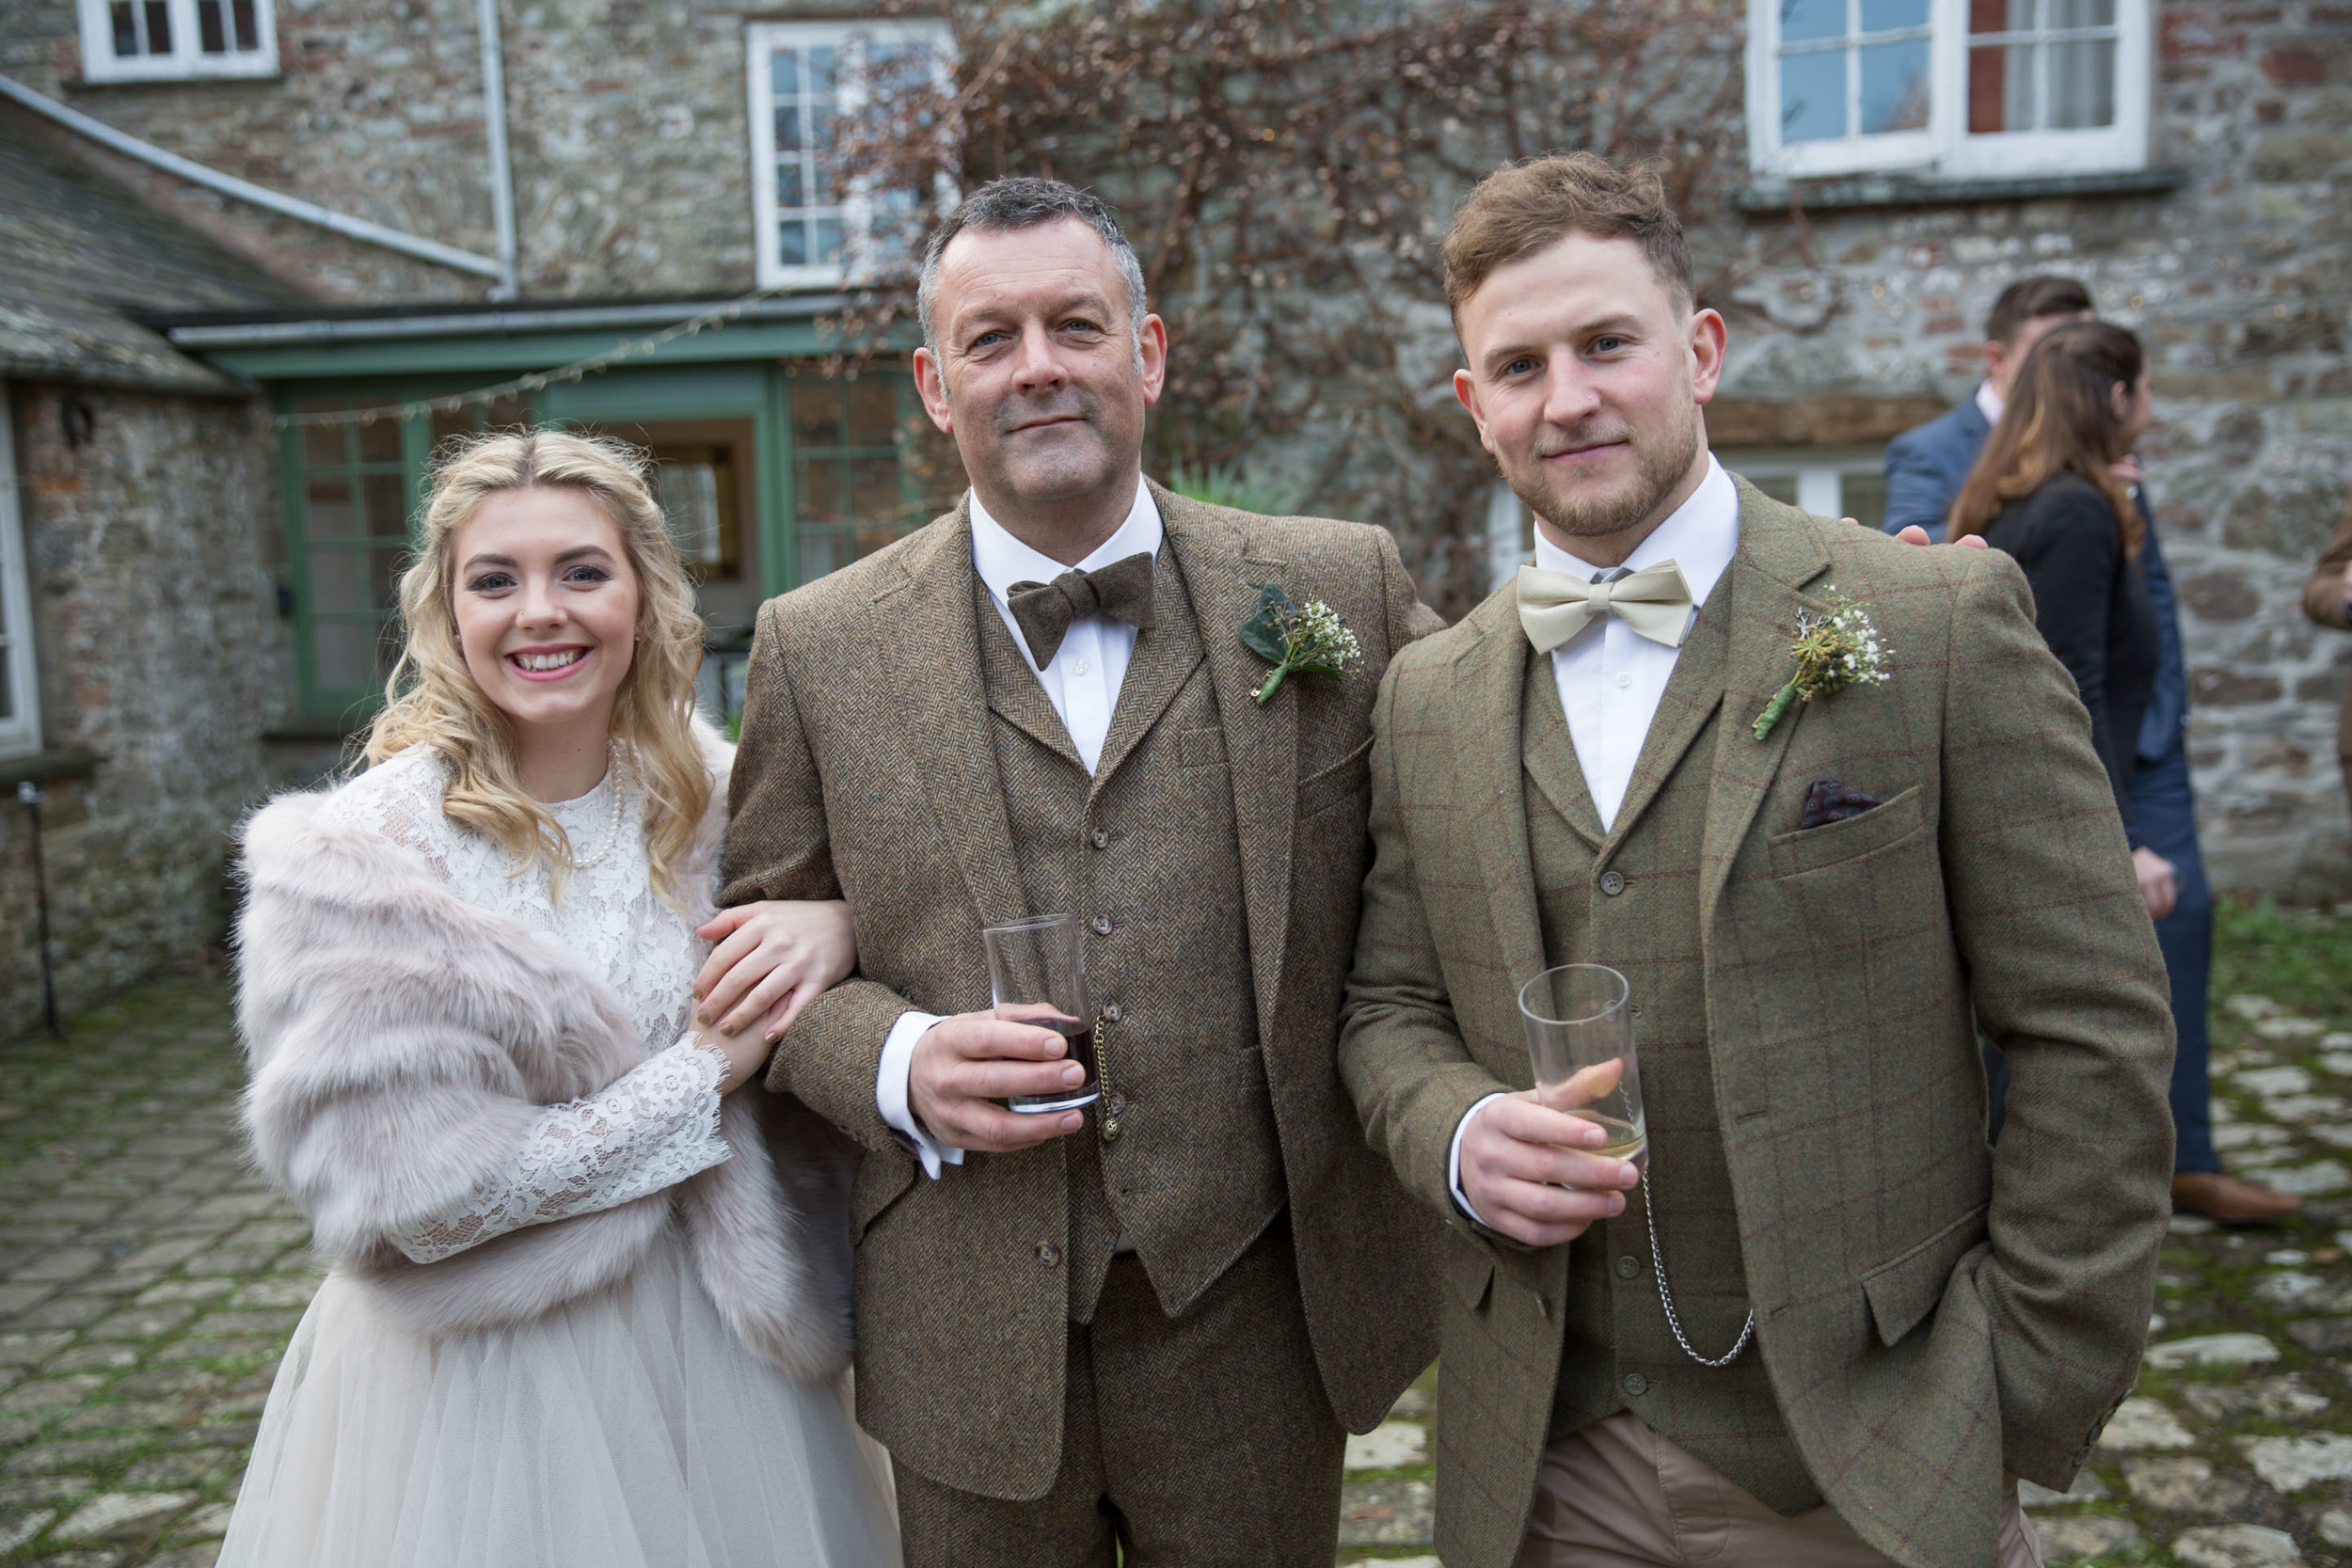 Jess & Ben - Bristol Wedding Photographer - Wright Wedding Photography - 90